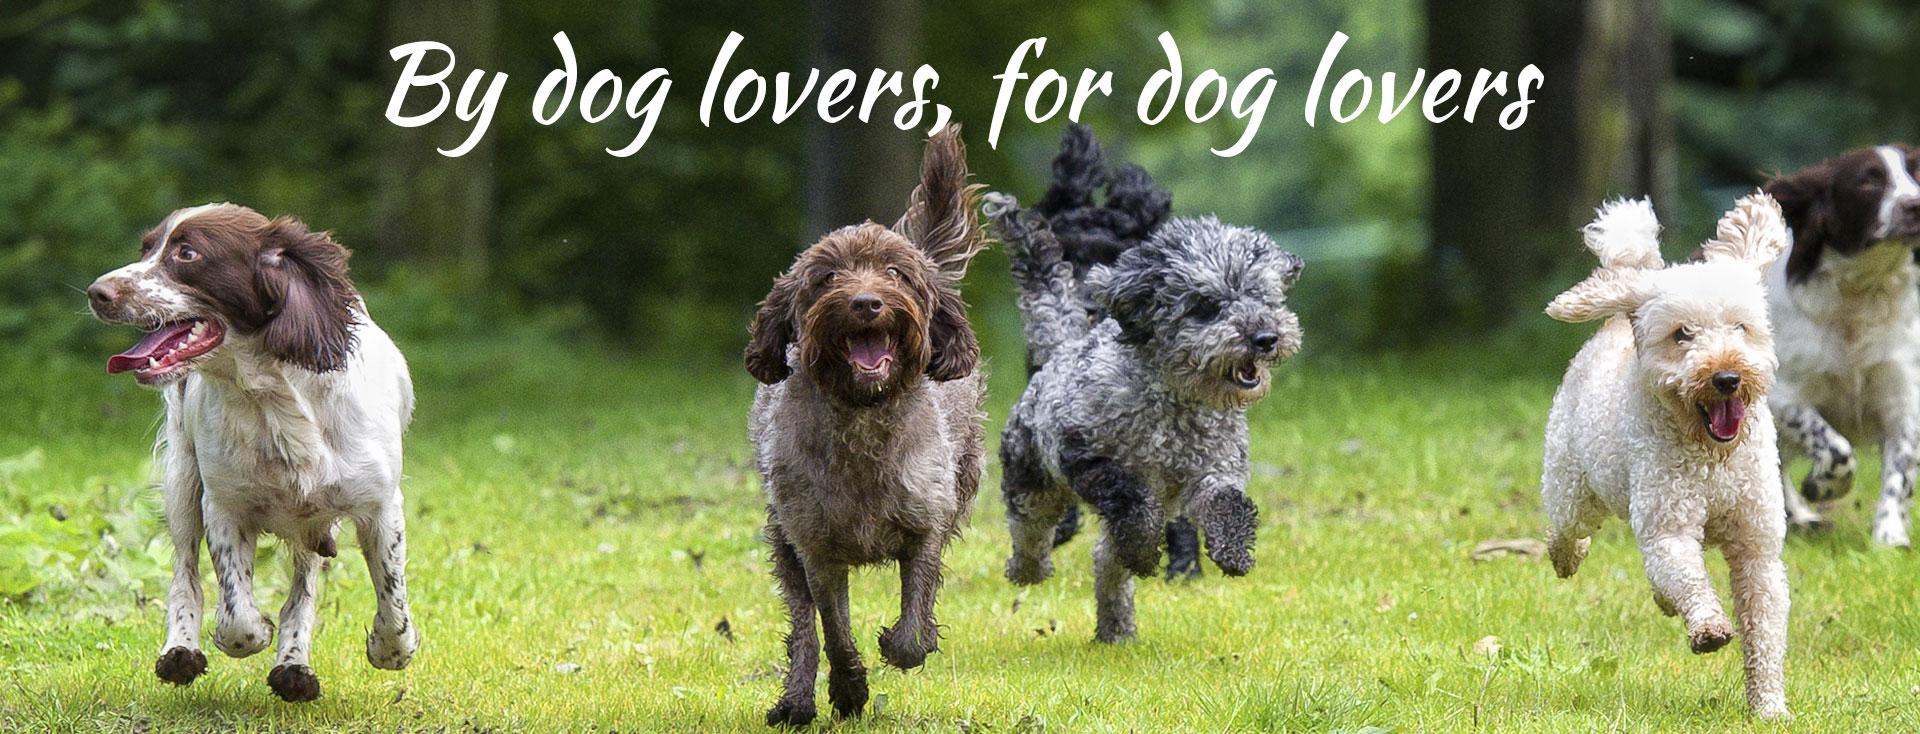 Organic diy dog wash brunswick dooba diy dog wash dooba dog wash melbourne diy dog wash melbourne solutioingenieria Choice Image